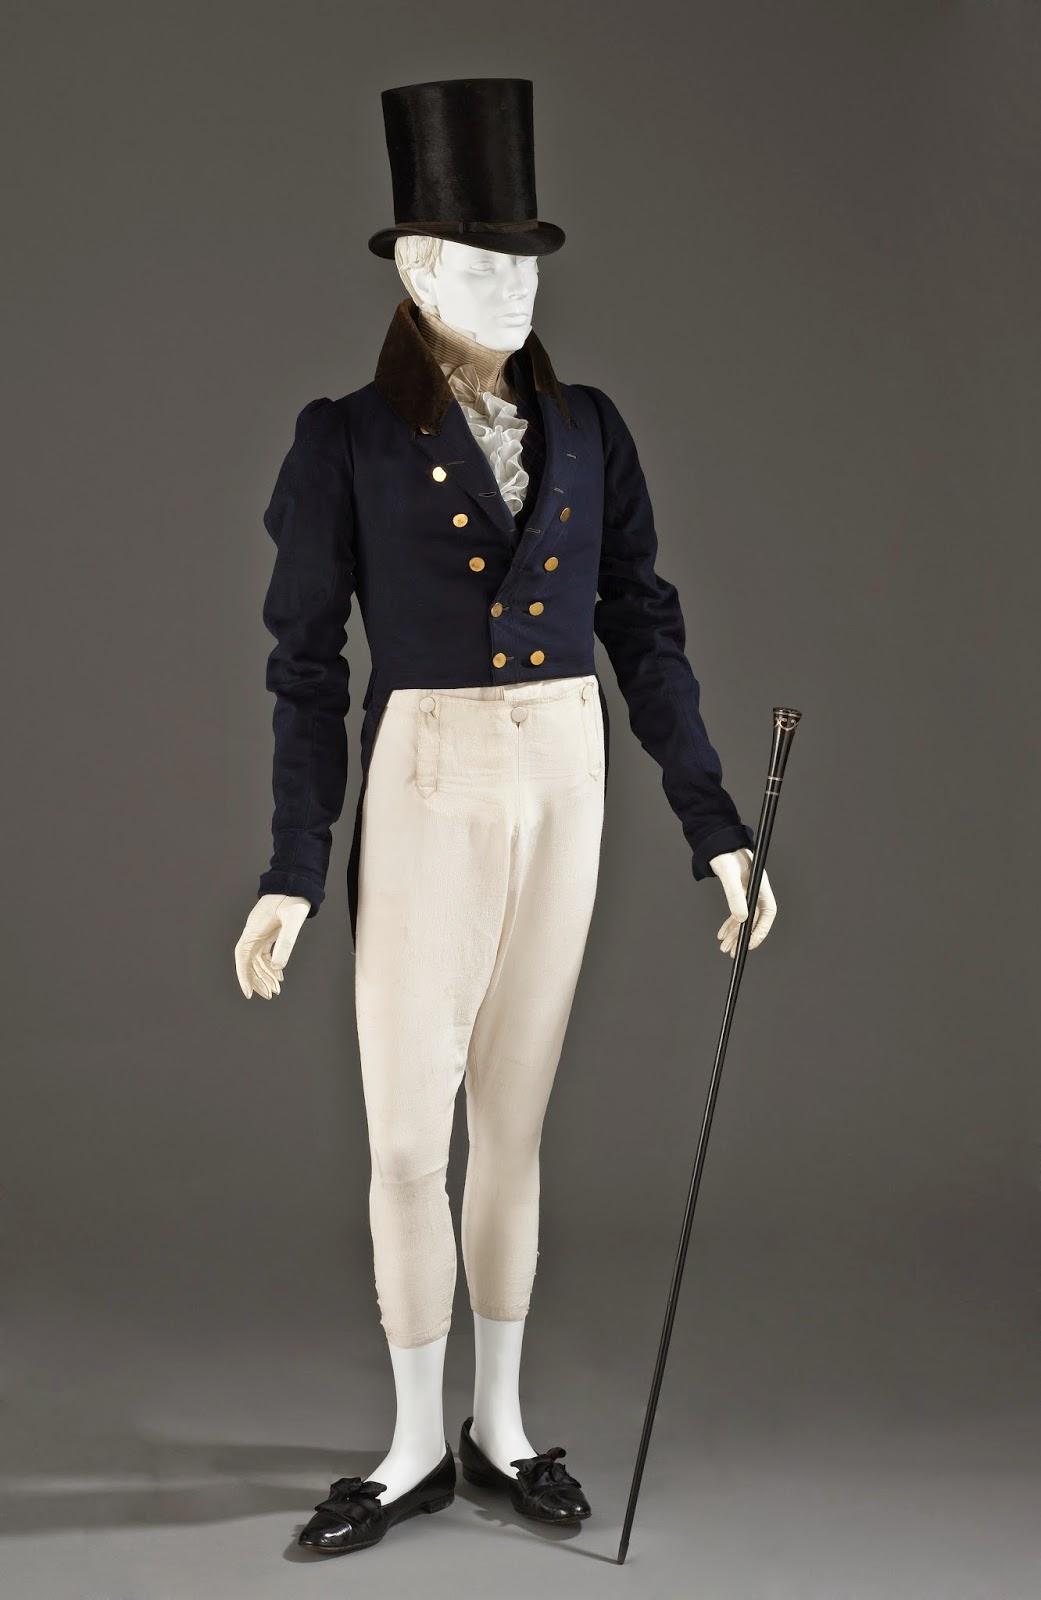 High heels in the wilderness legging love for 1825 2